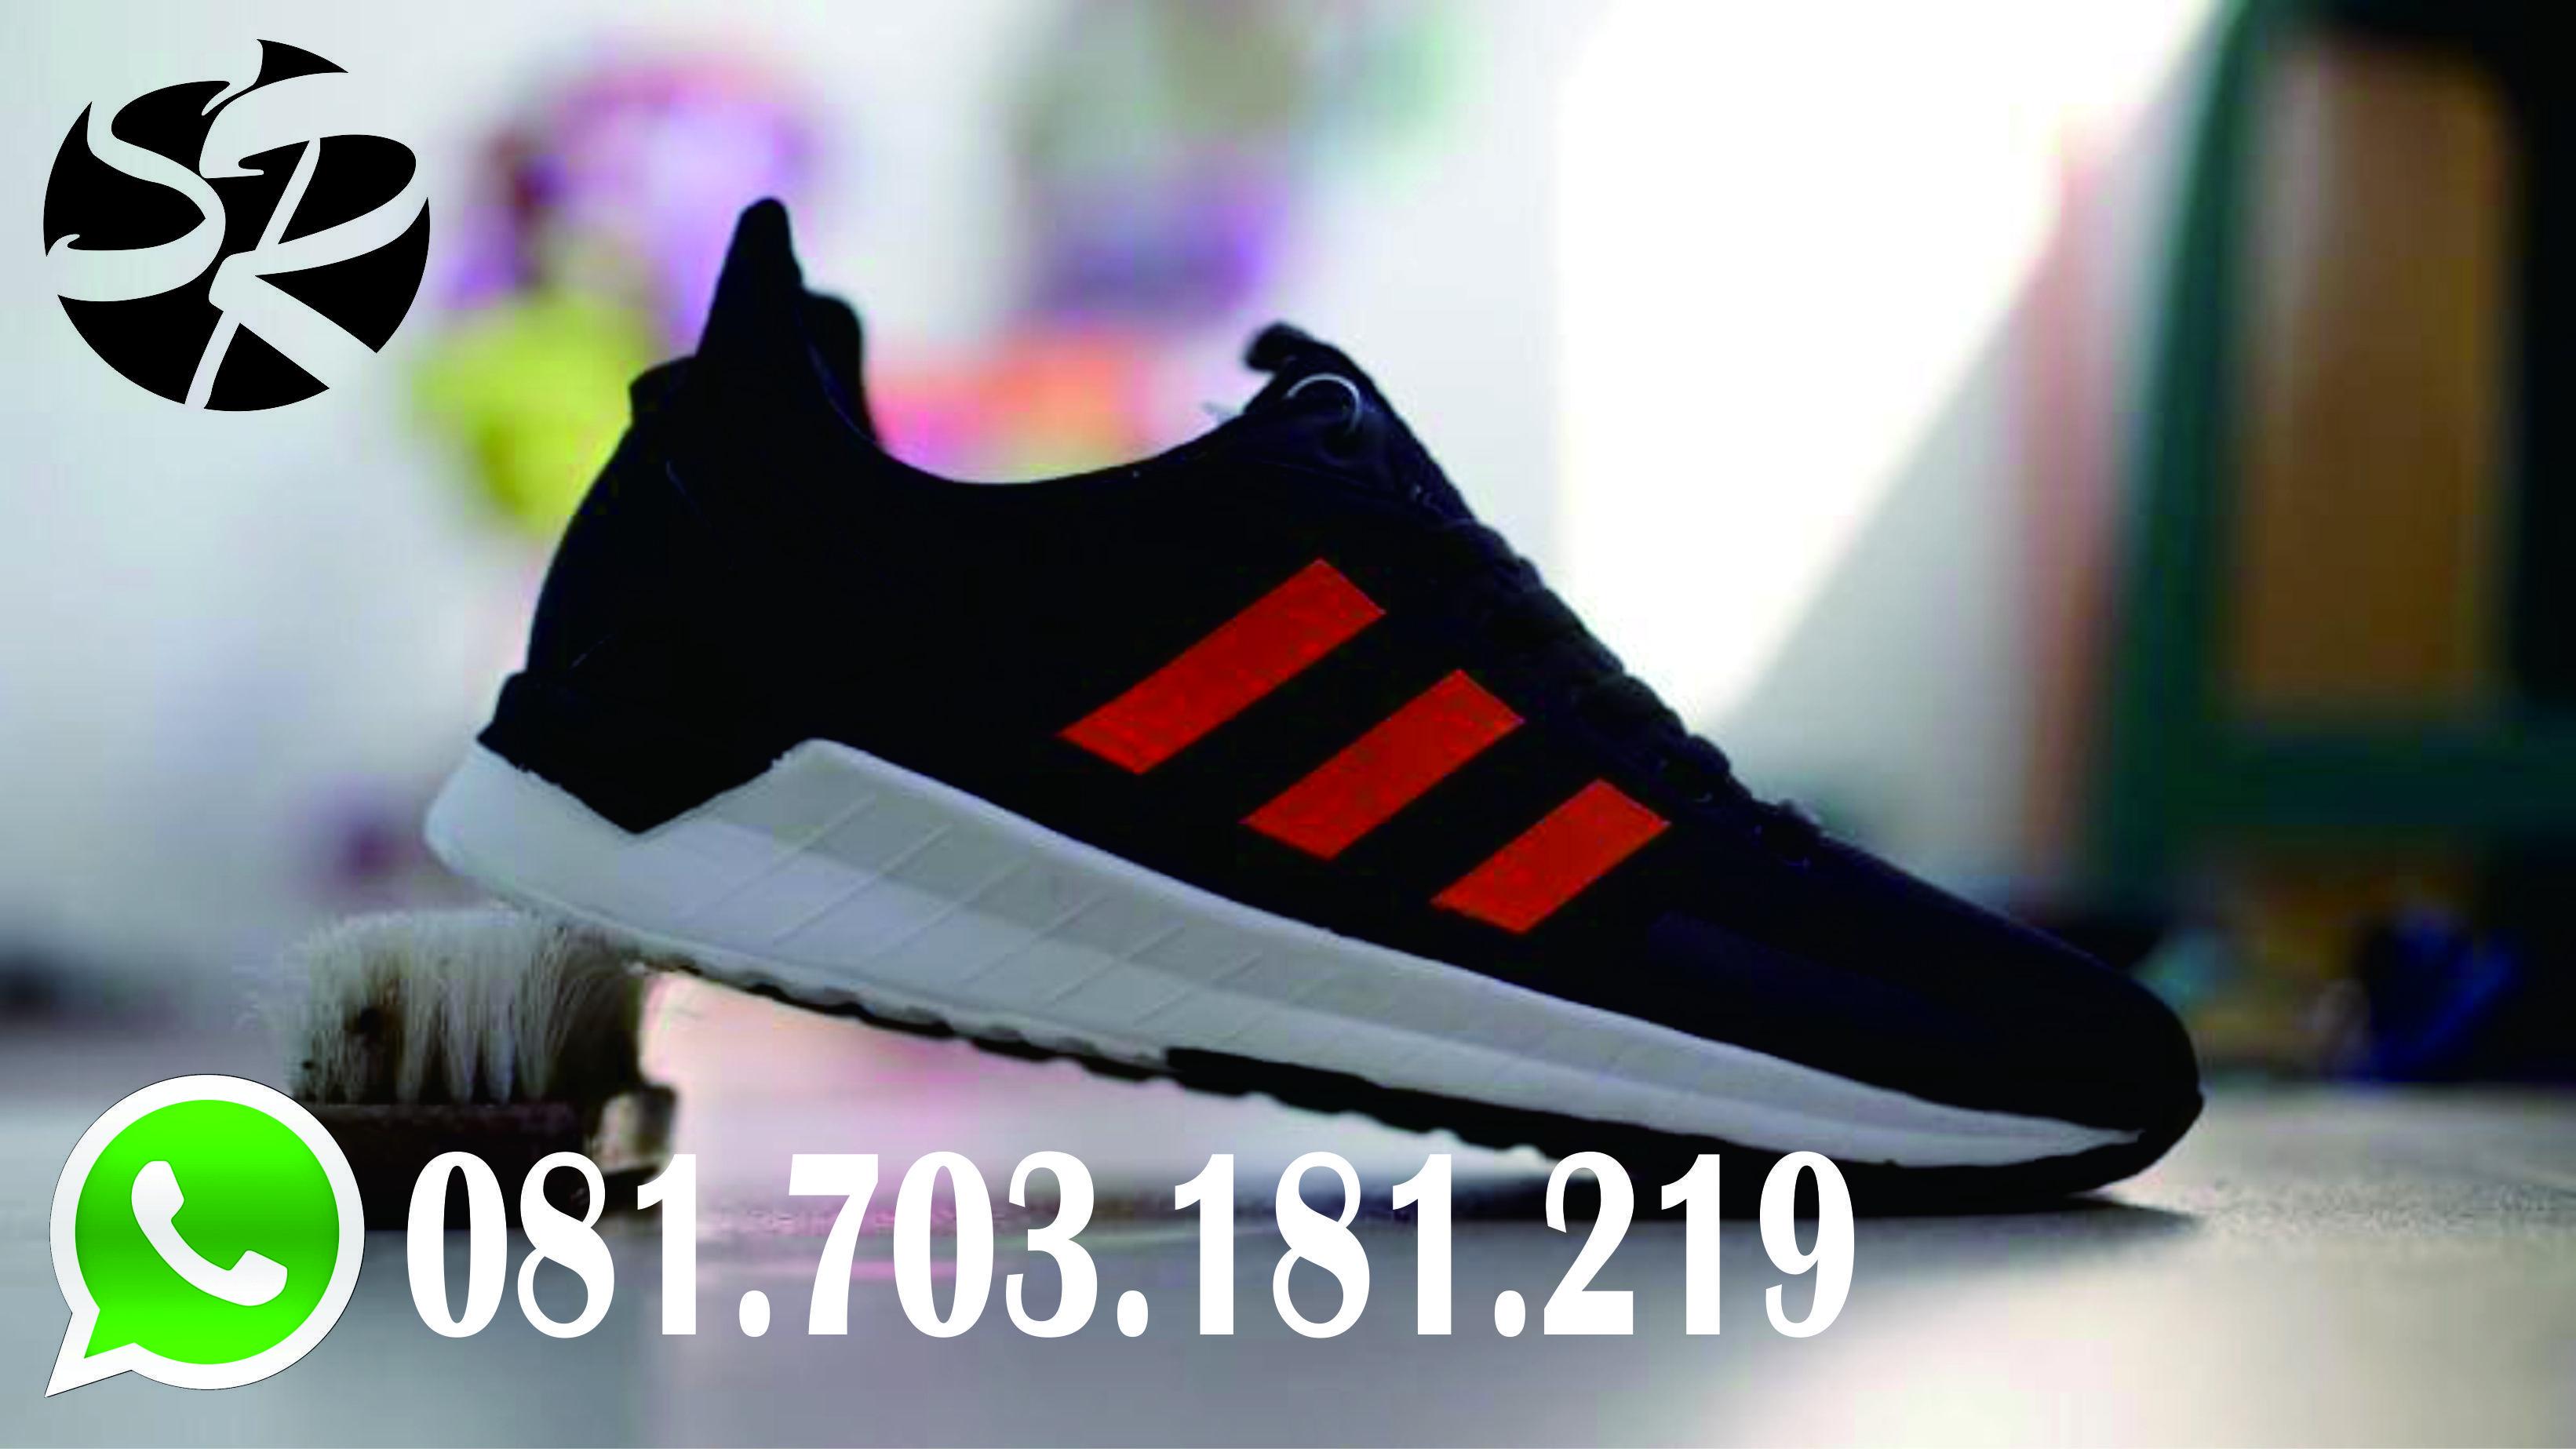 Sepatu Sekolah Sepatu Sekolah Cowok Sepatu Sekolah Cewek Sepatu